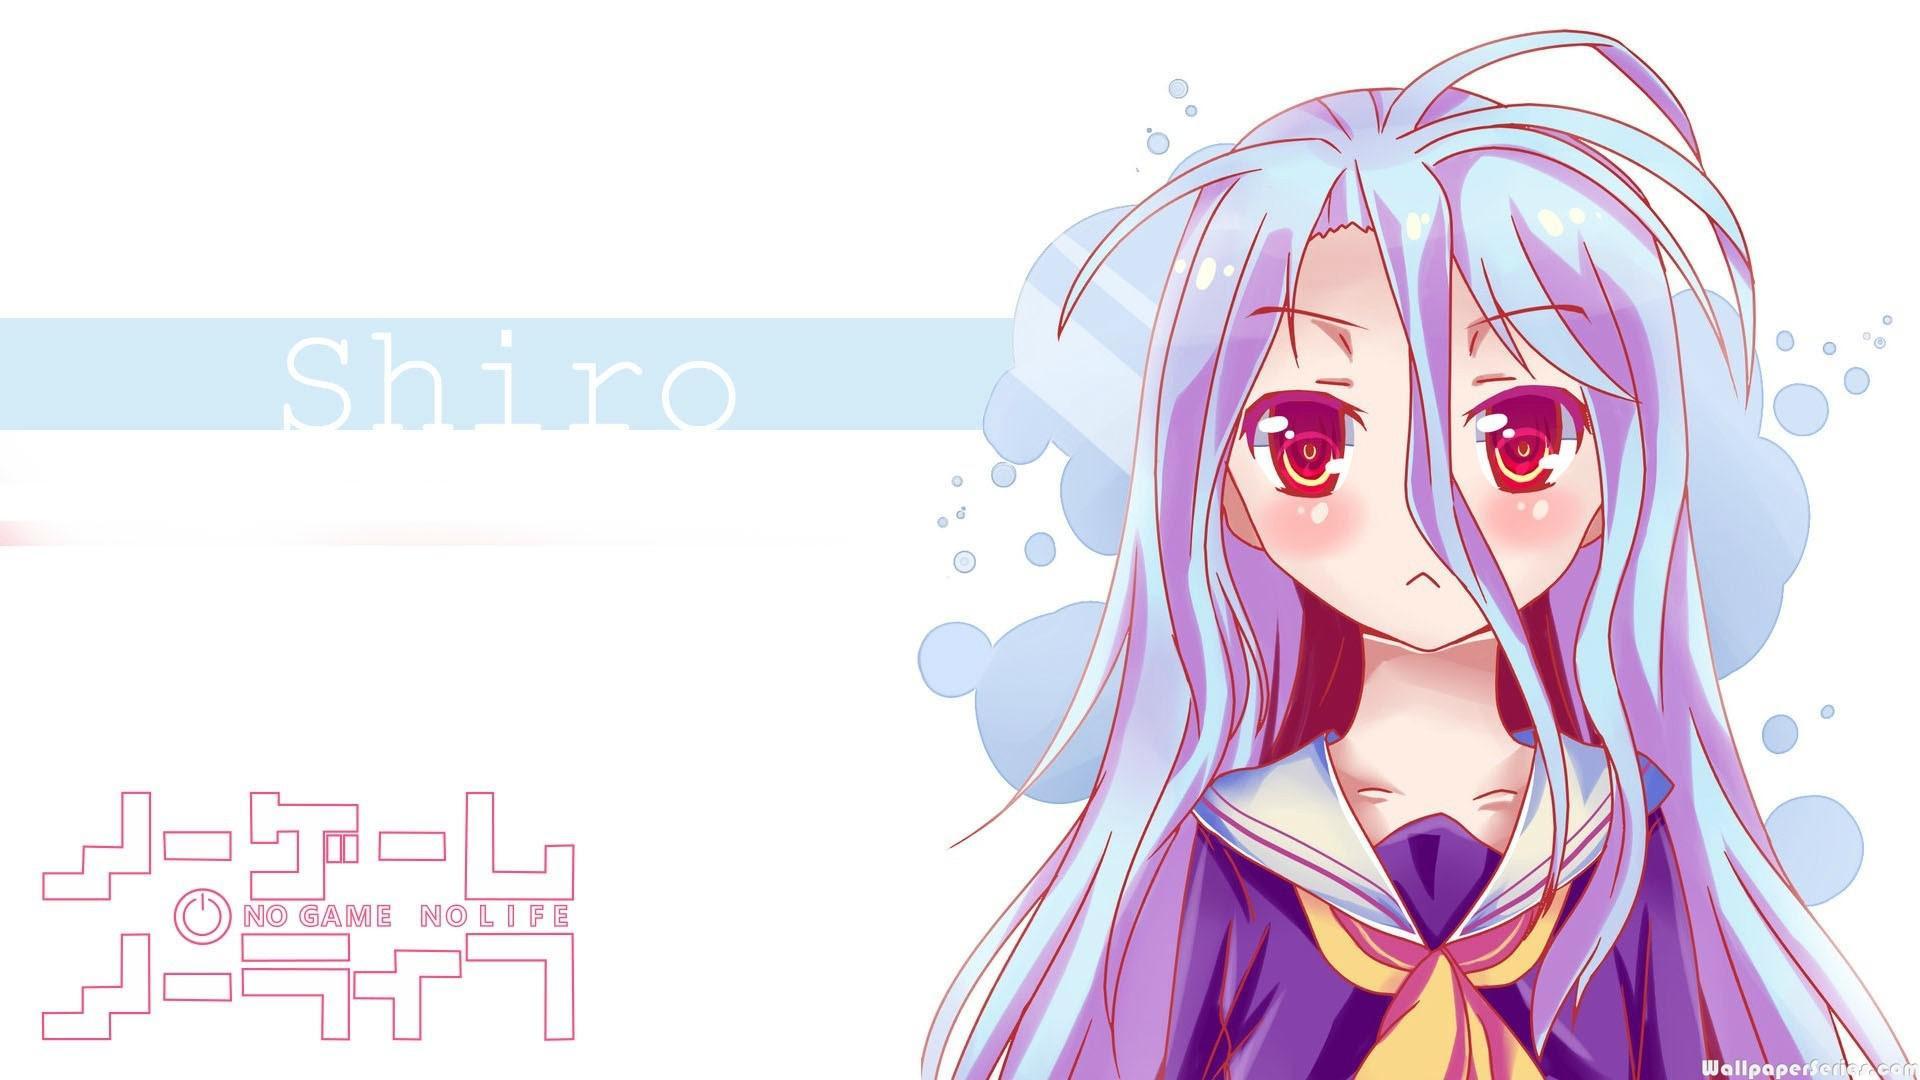 Hd Cute Girl Shiro No Game No Life Wallpaper Download Free